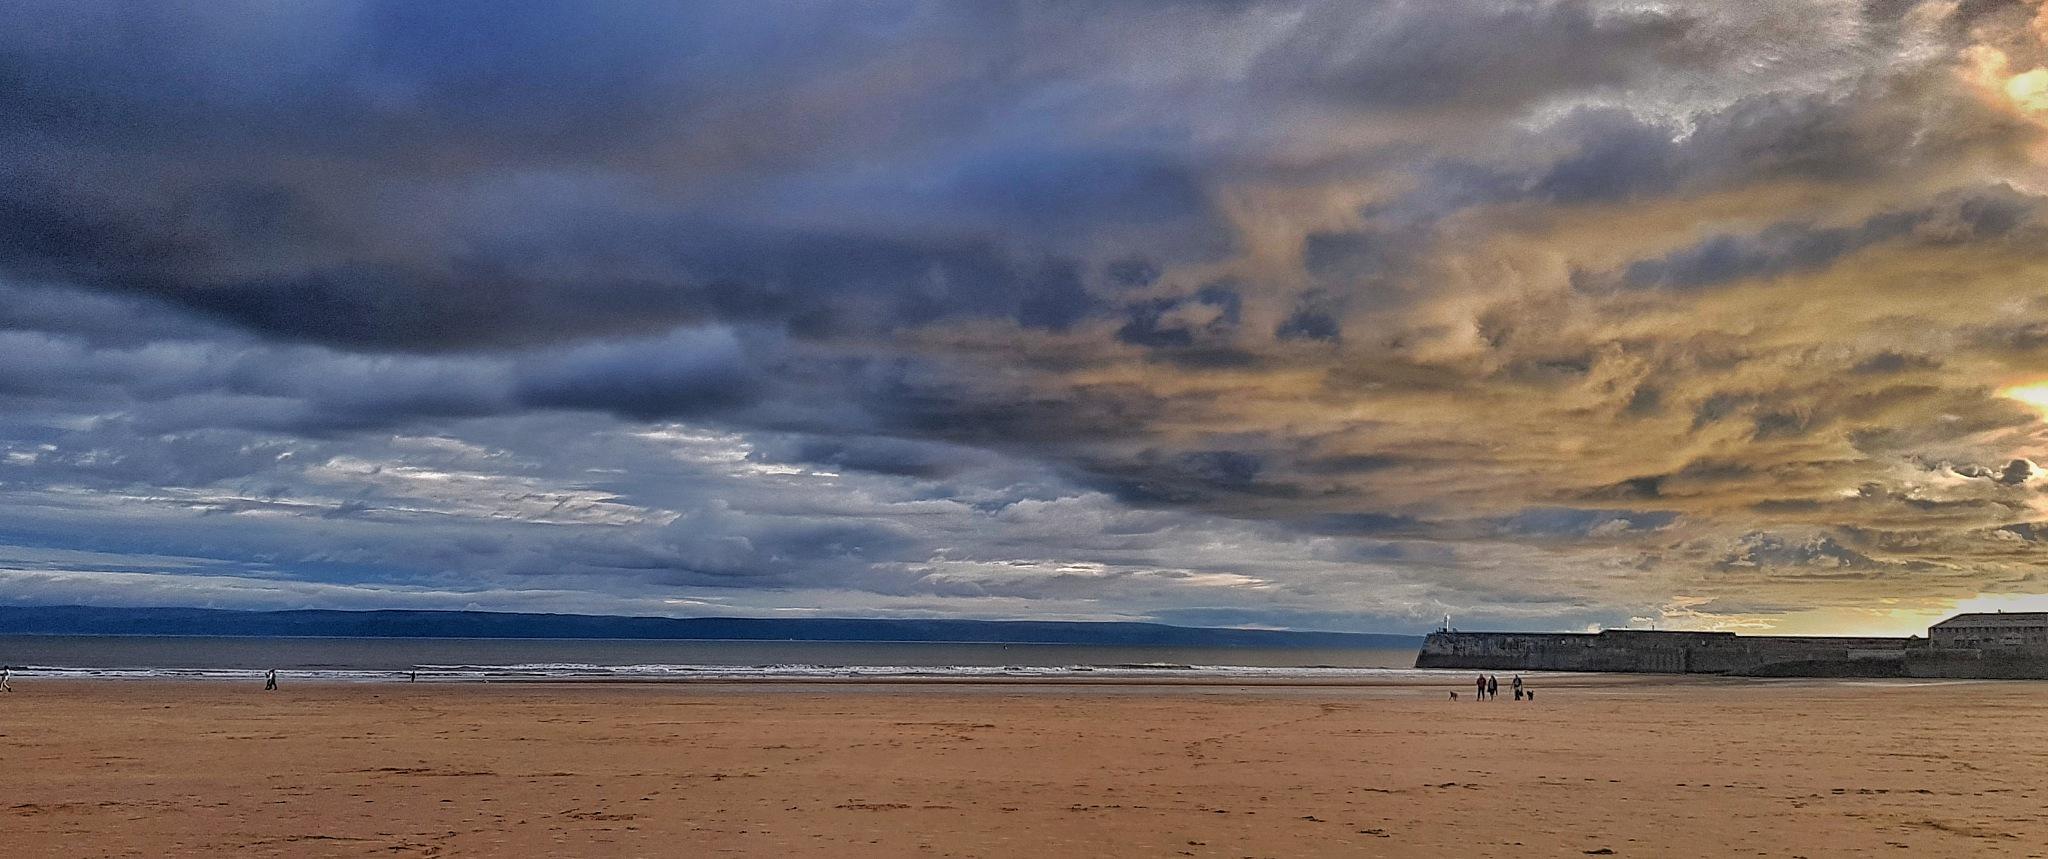 Storm clouds  by bryan.ashford 52